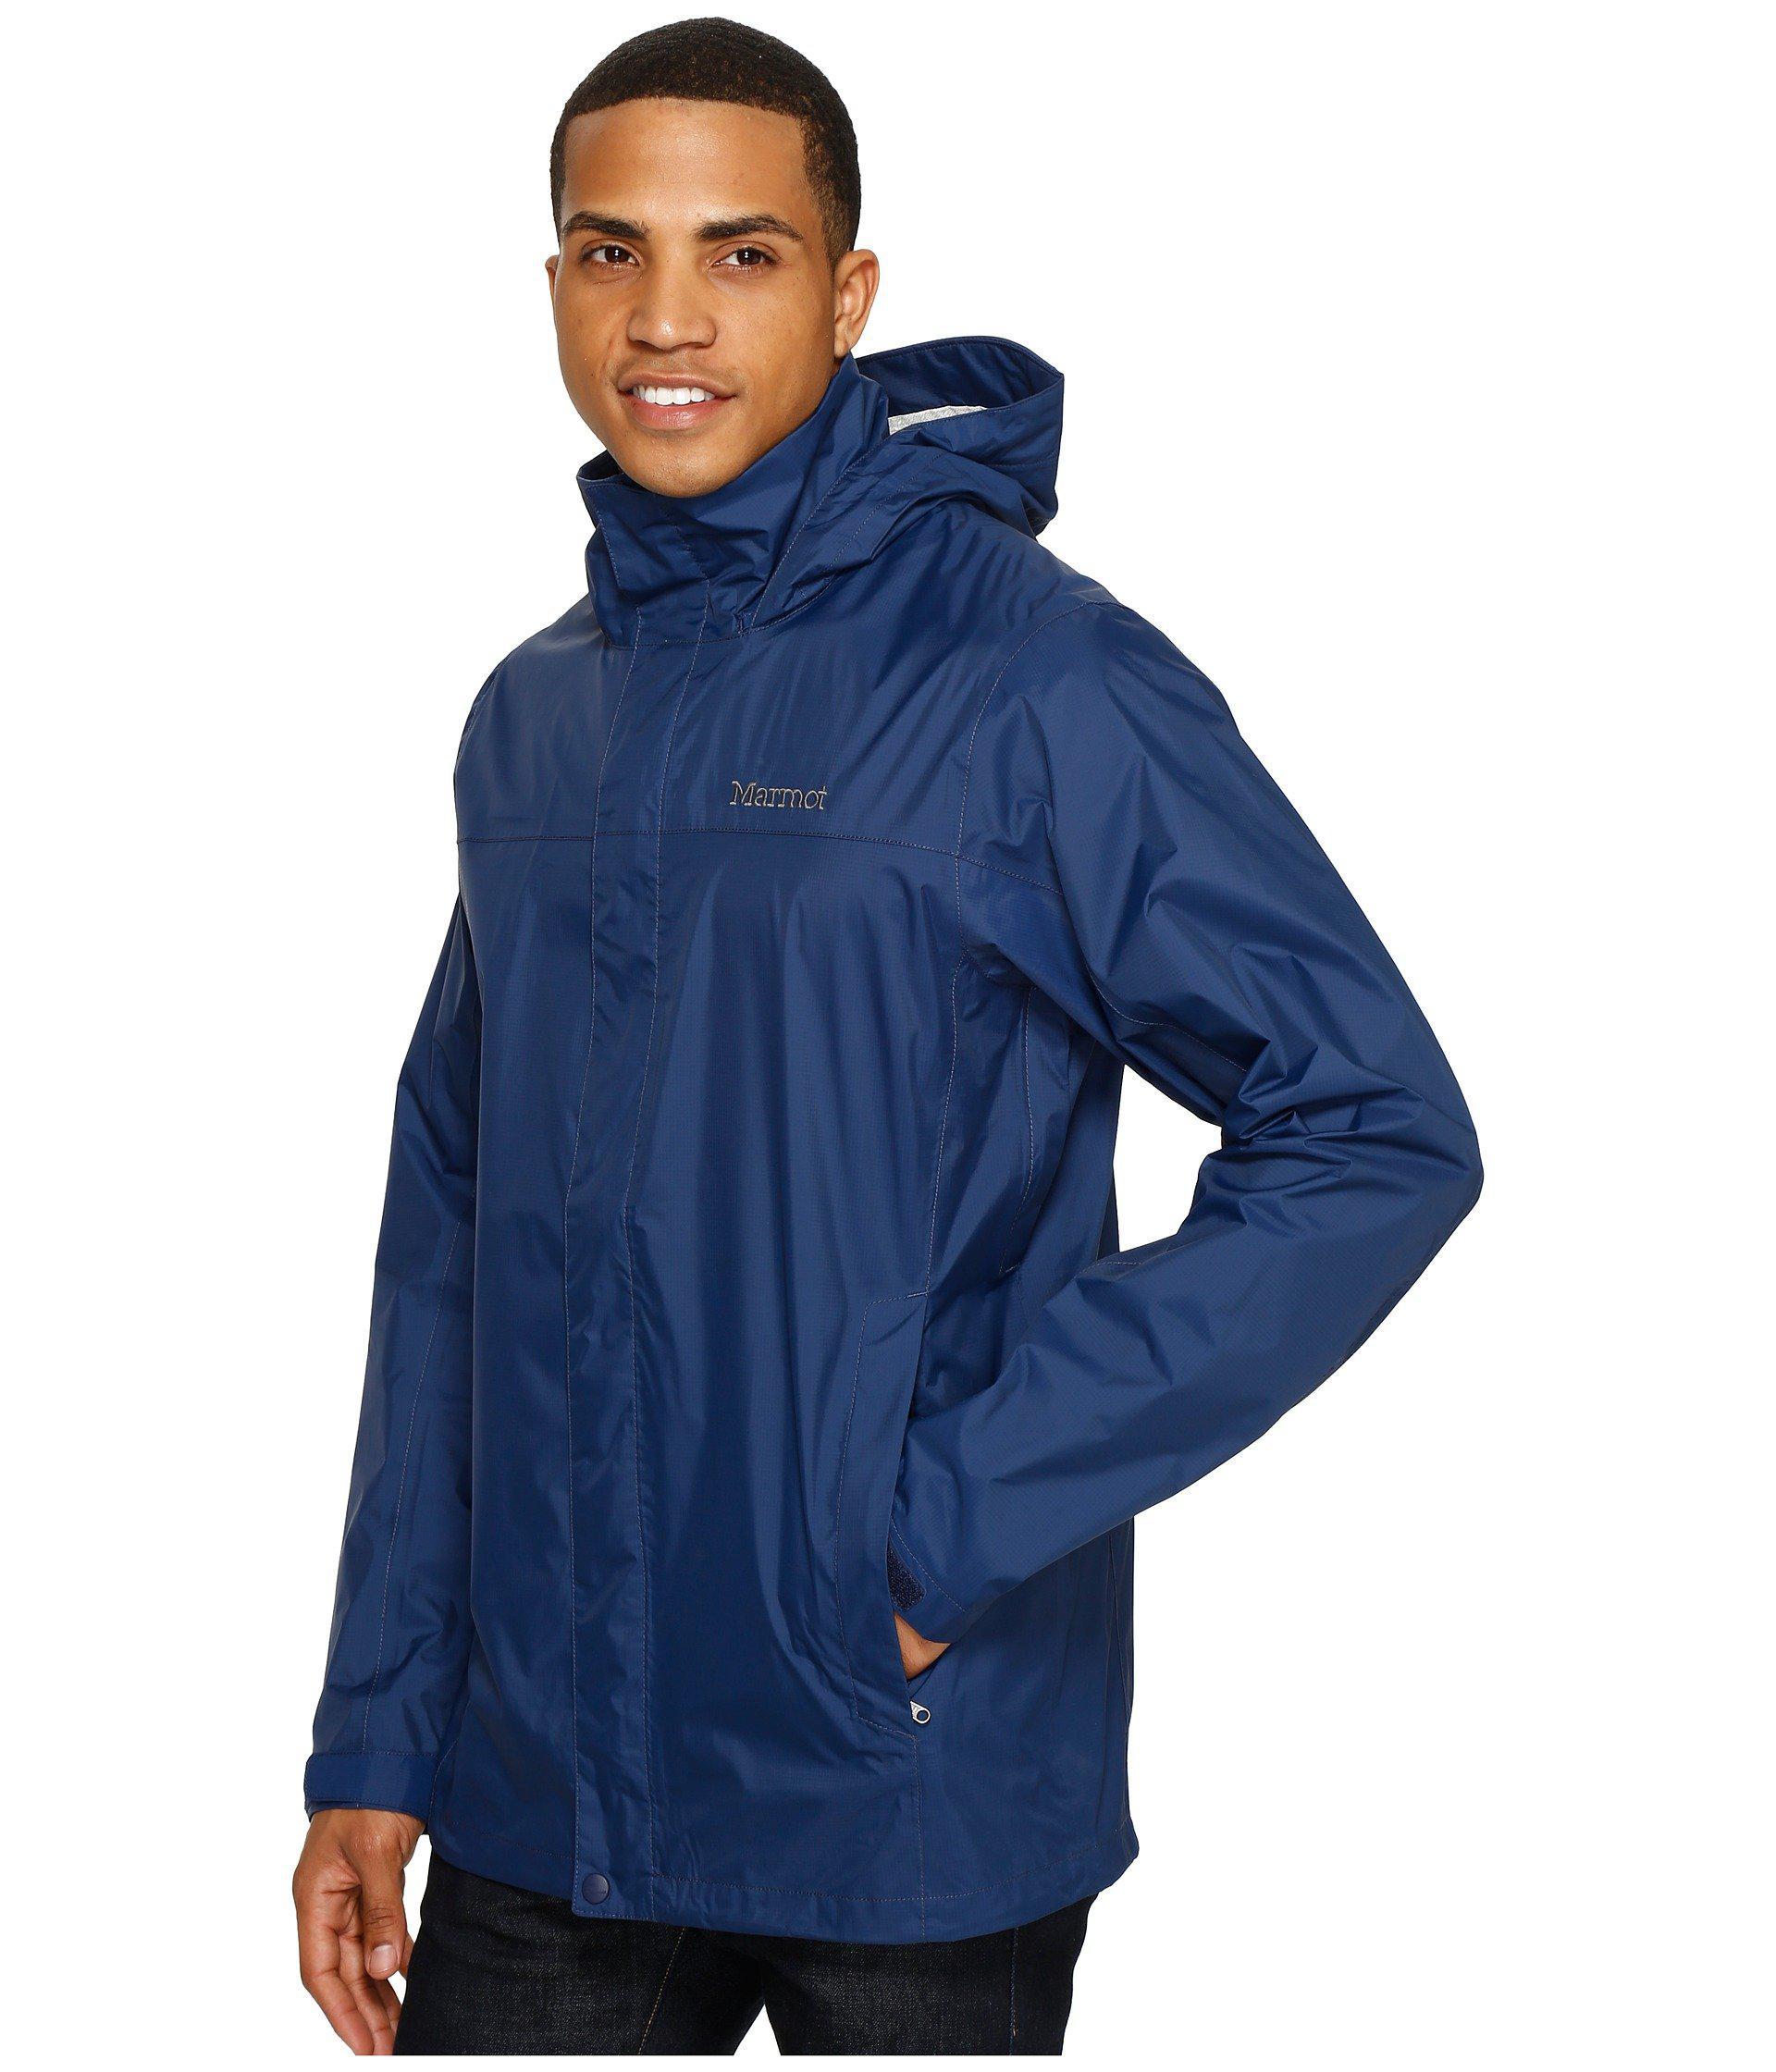 Lyst - Marmot Precip(r) Jacket Tall (arctic Navy) Men s Jacket in Blue for  Men 8b6a472a9